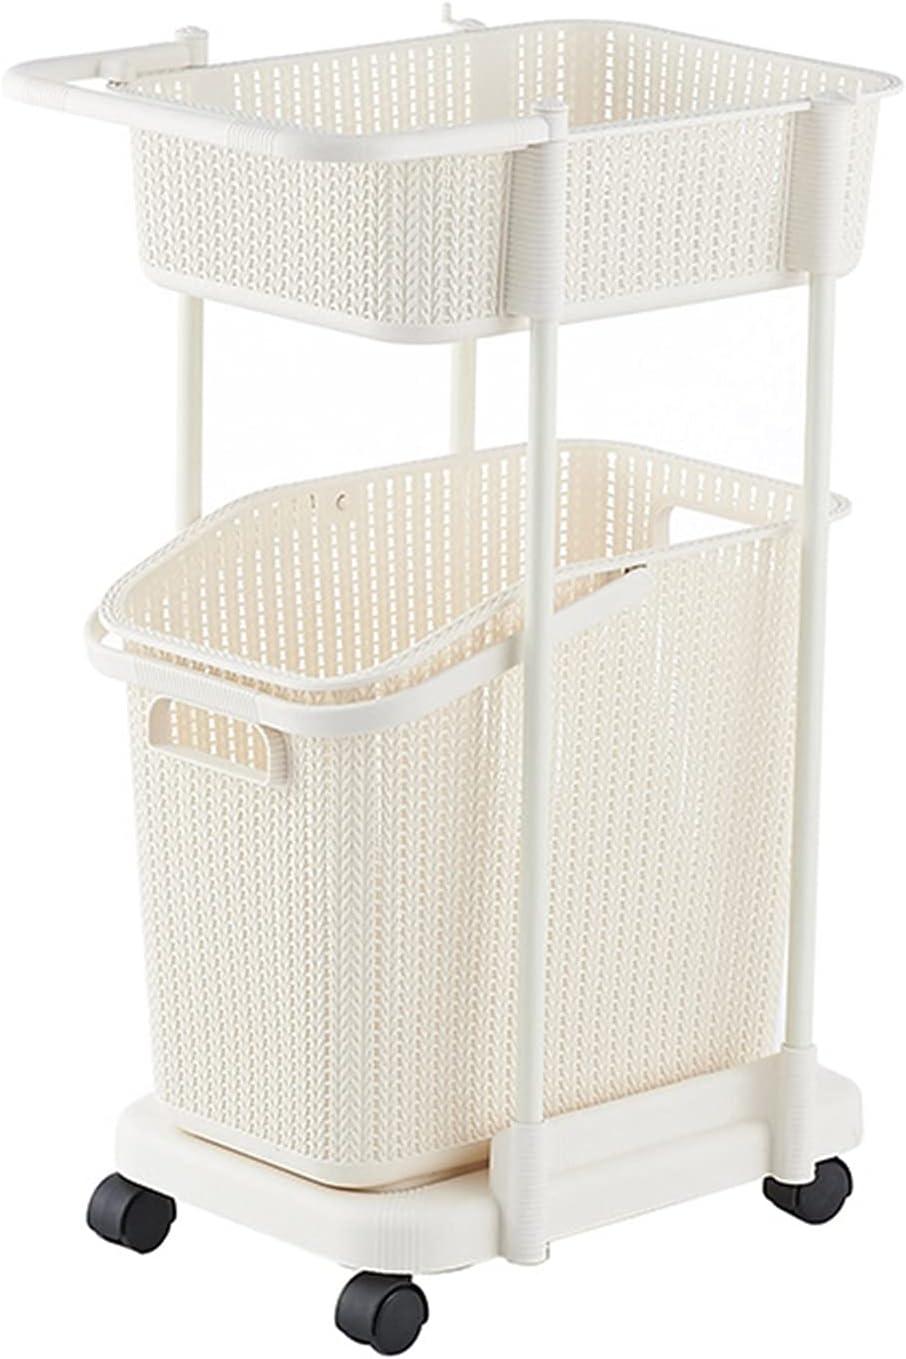 QFFL Laundry Rapid rise Corner 2021 new Multi-Layer Clothes Basket Bathroom Towel S